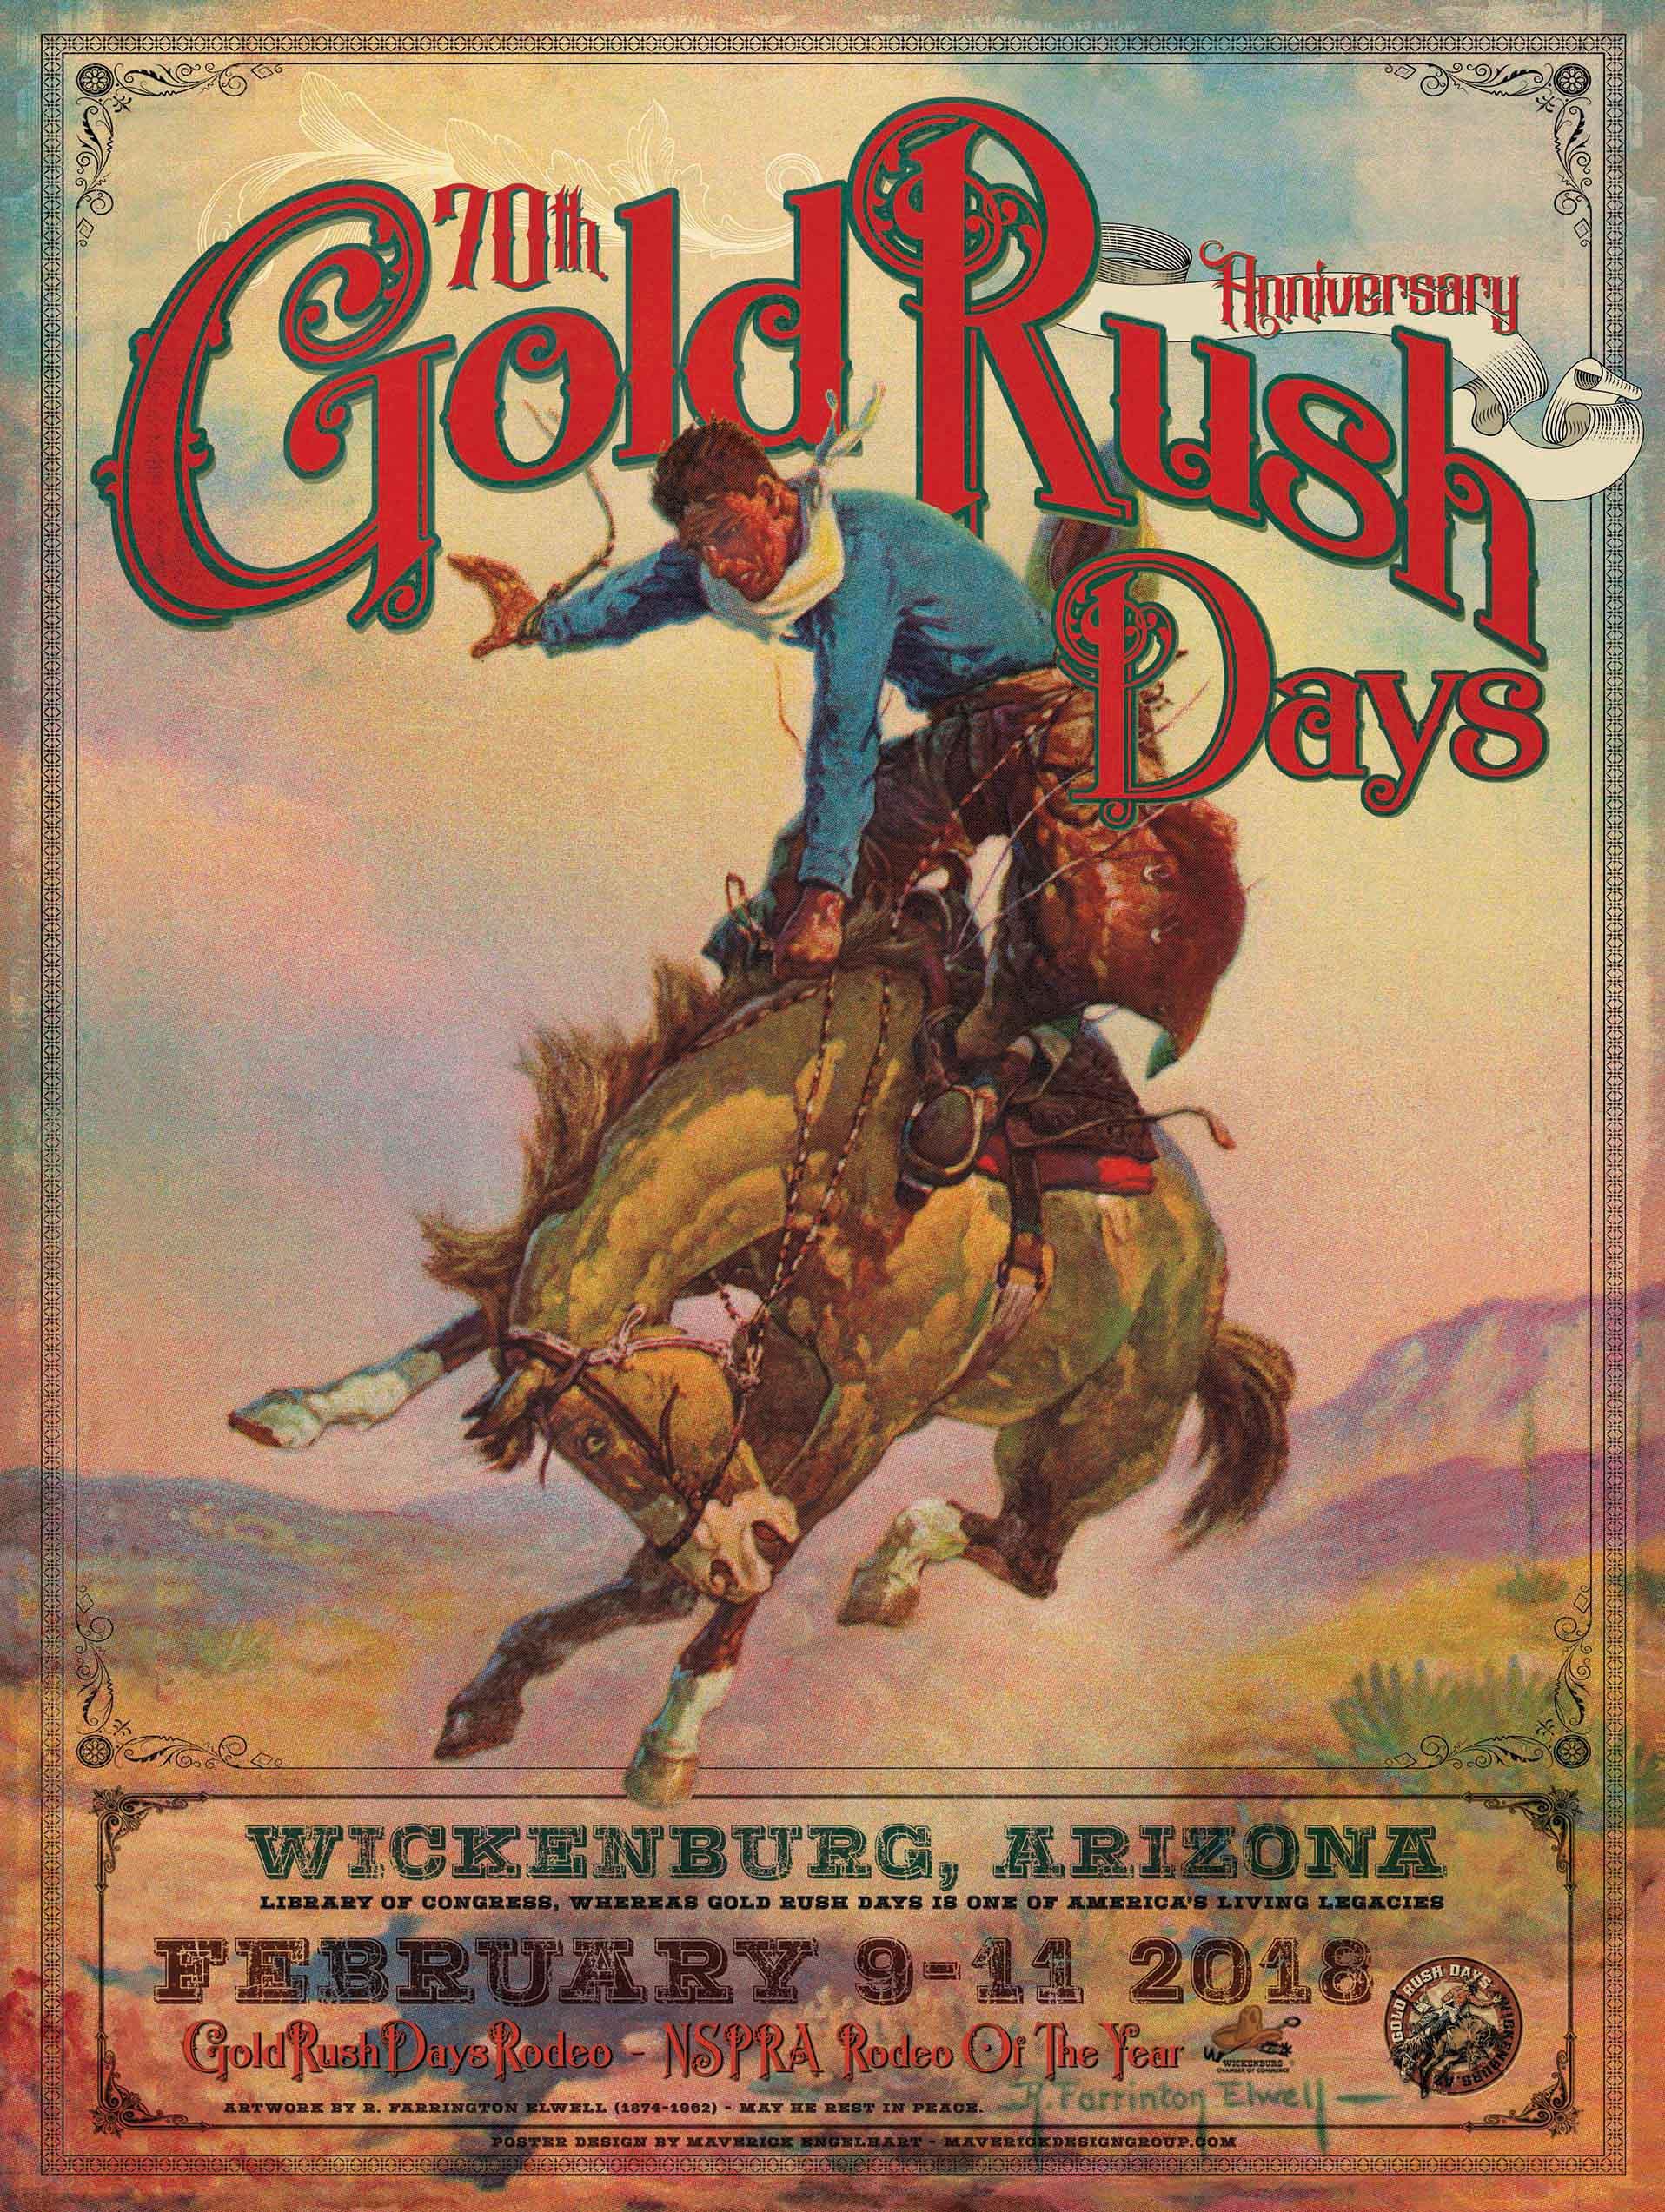 70th Anniversary Gold Rush Days Poster